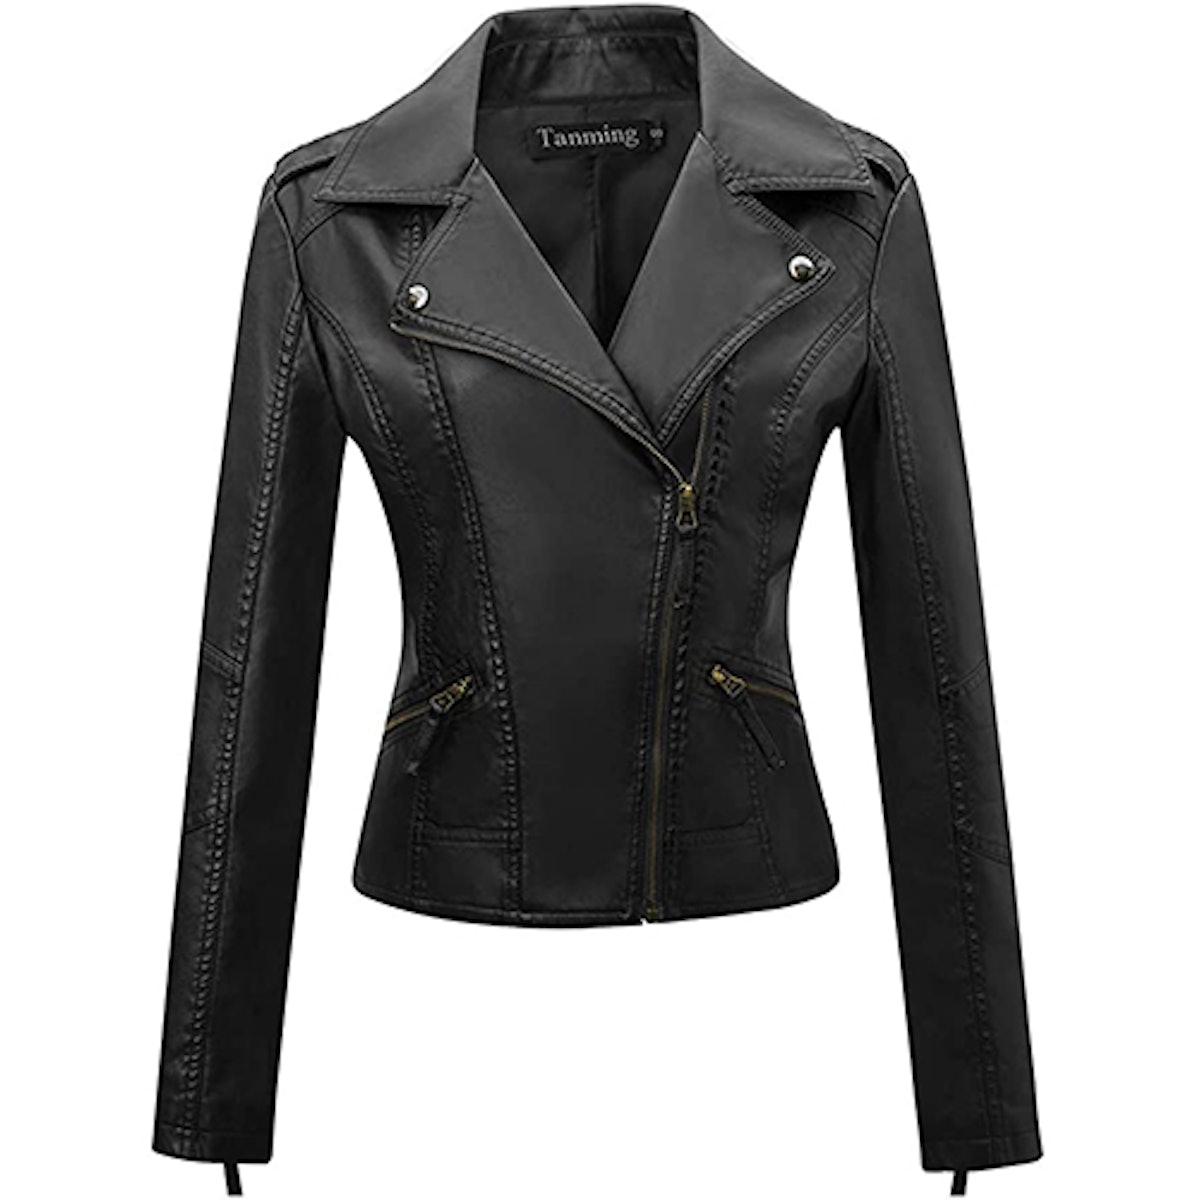 Tanming Faux Leather Moto Jacket